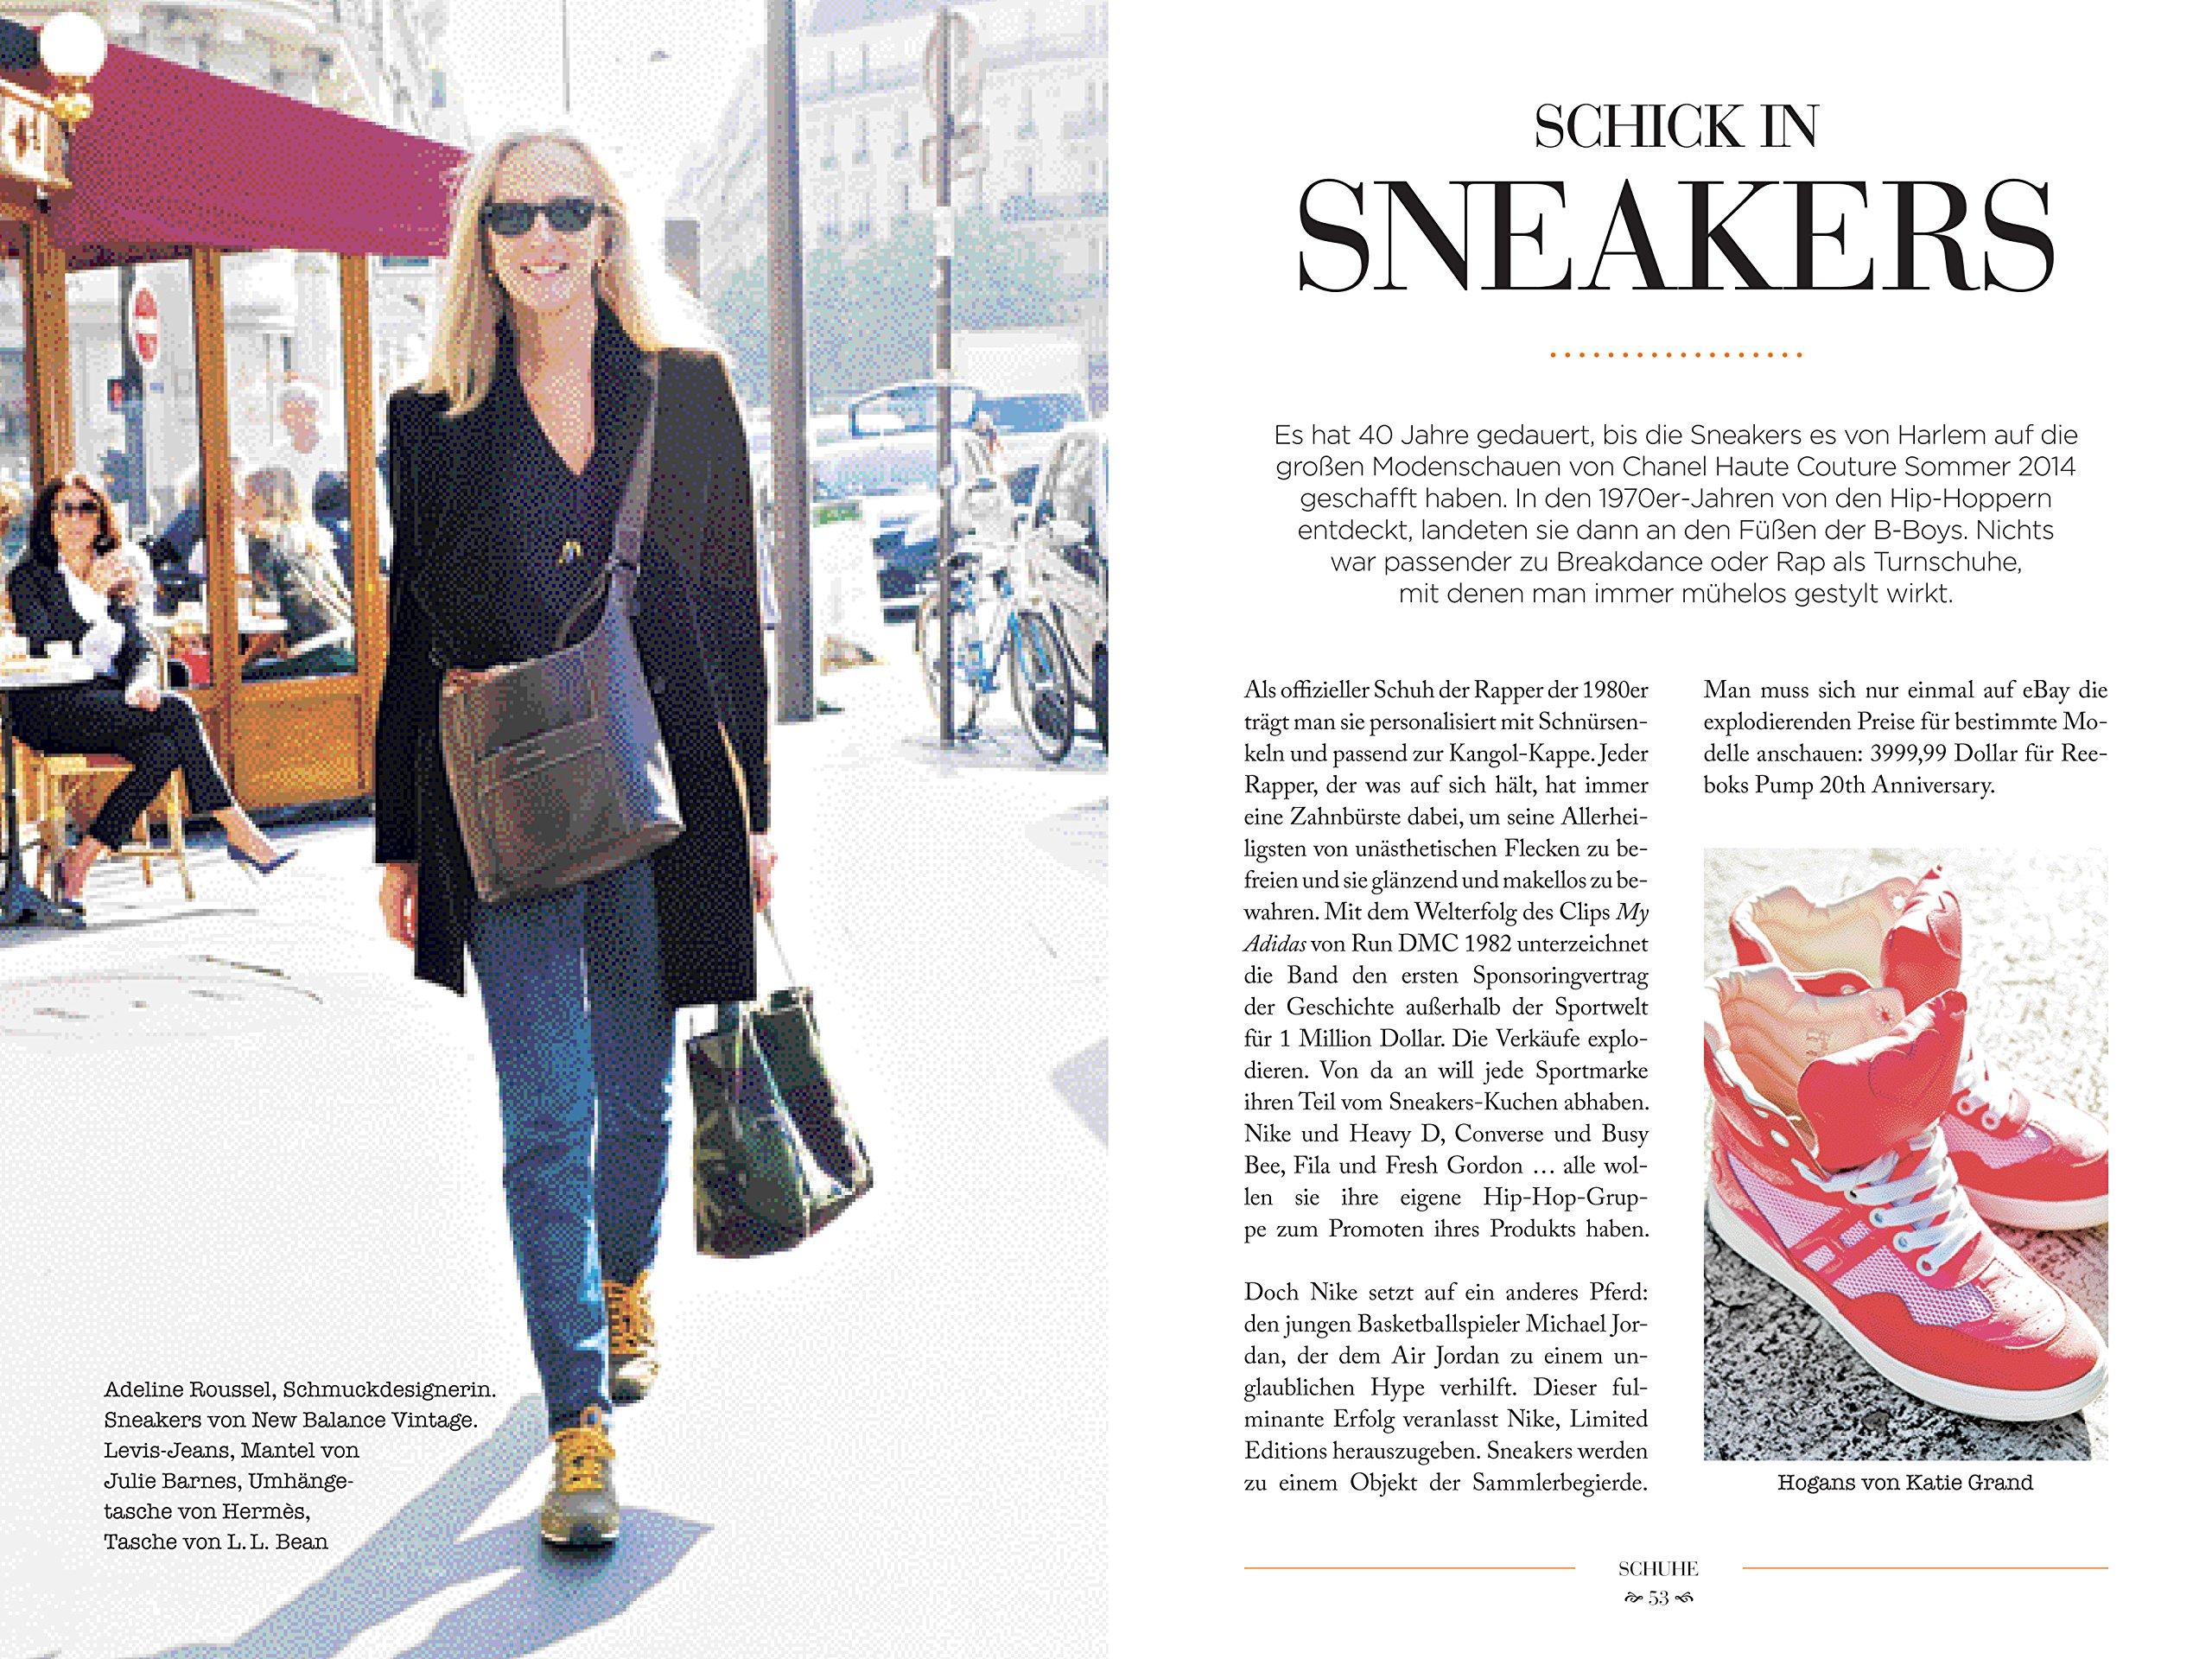 Ultimative Schuhe StyleguideFrédérique Veysset Der xQrdCtsh